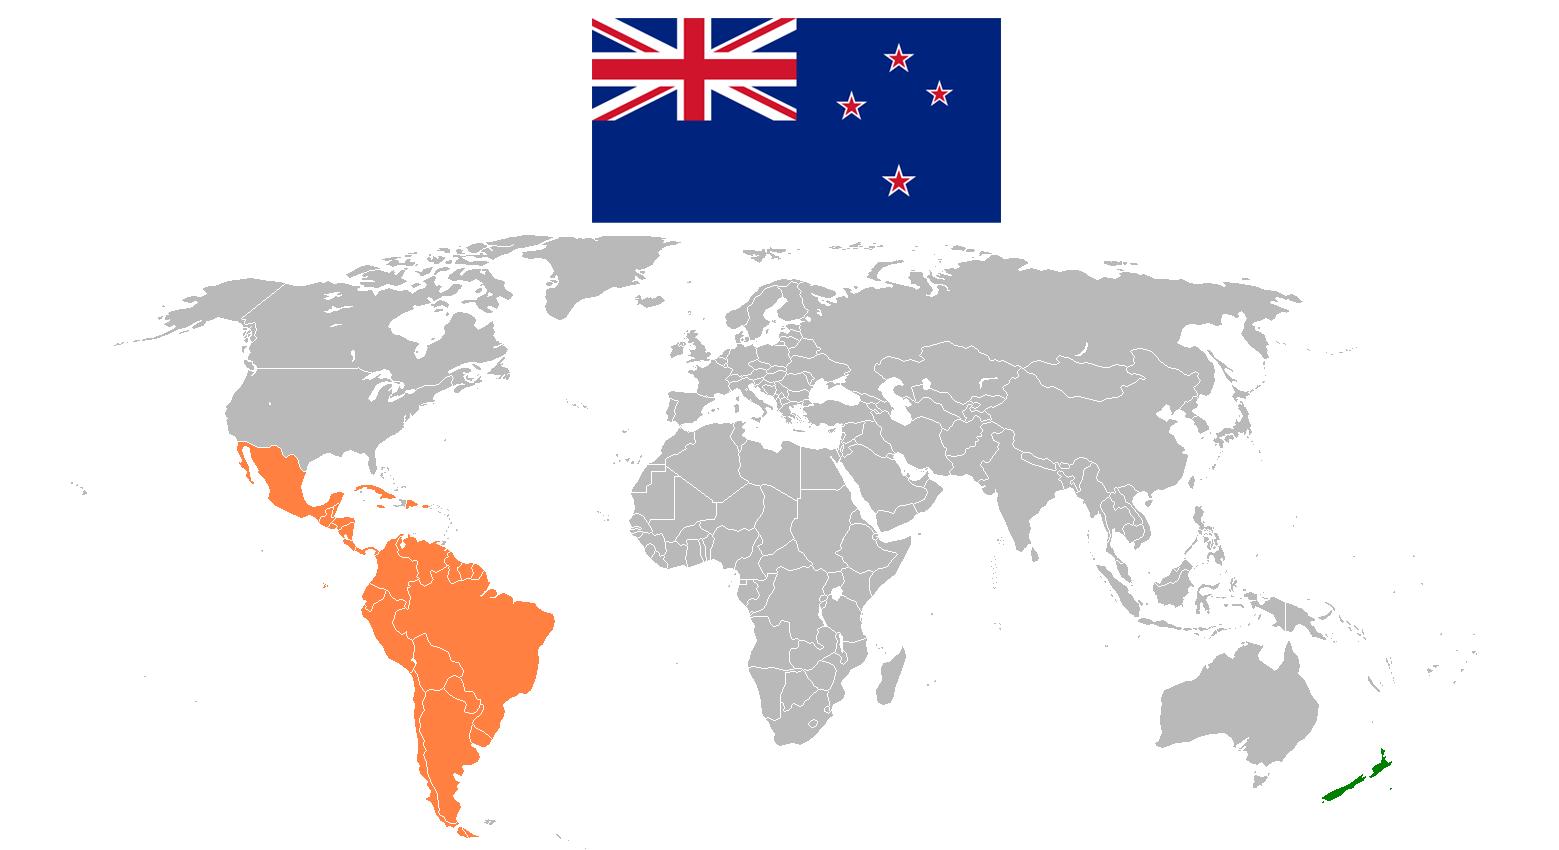 FileNZLatin America Locator MapPNG Wikimedia Commons - Map of the latin america